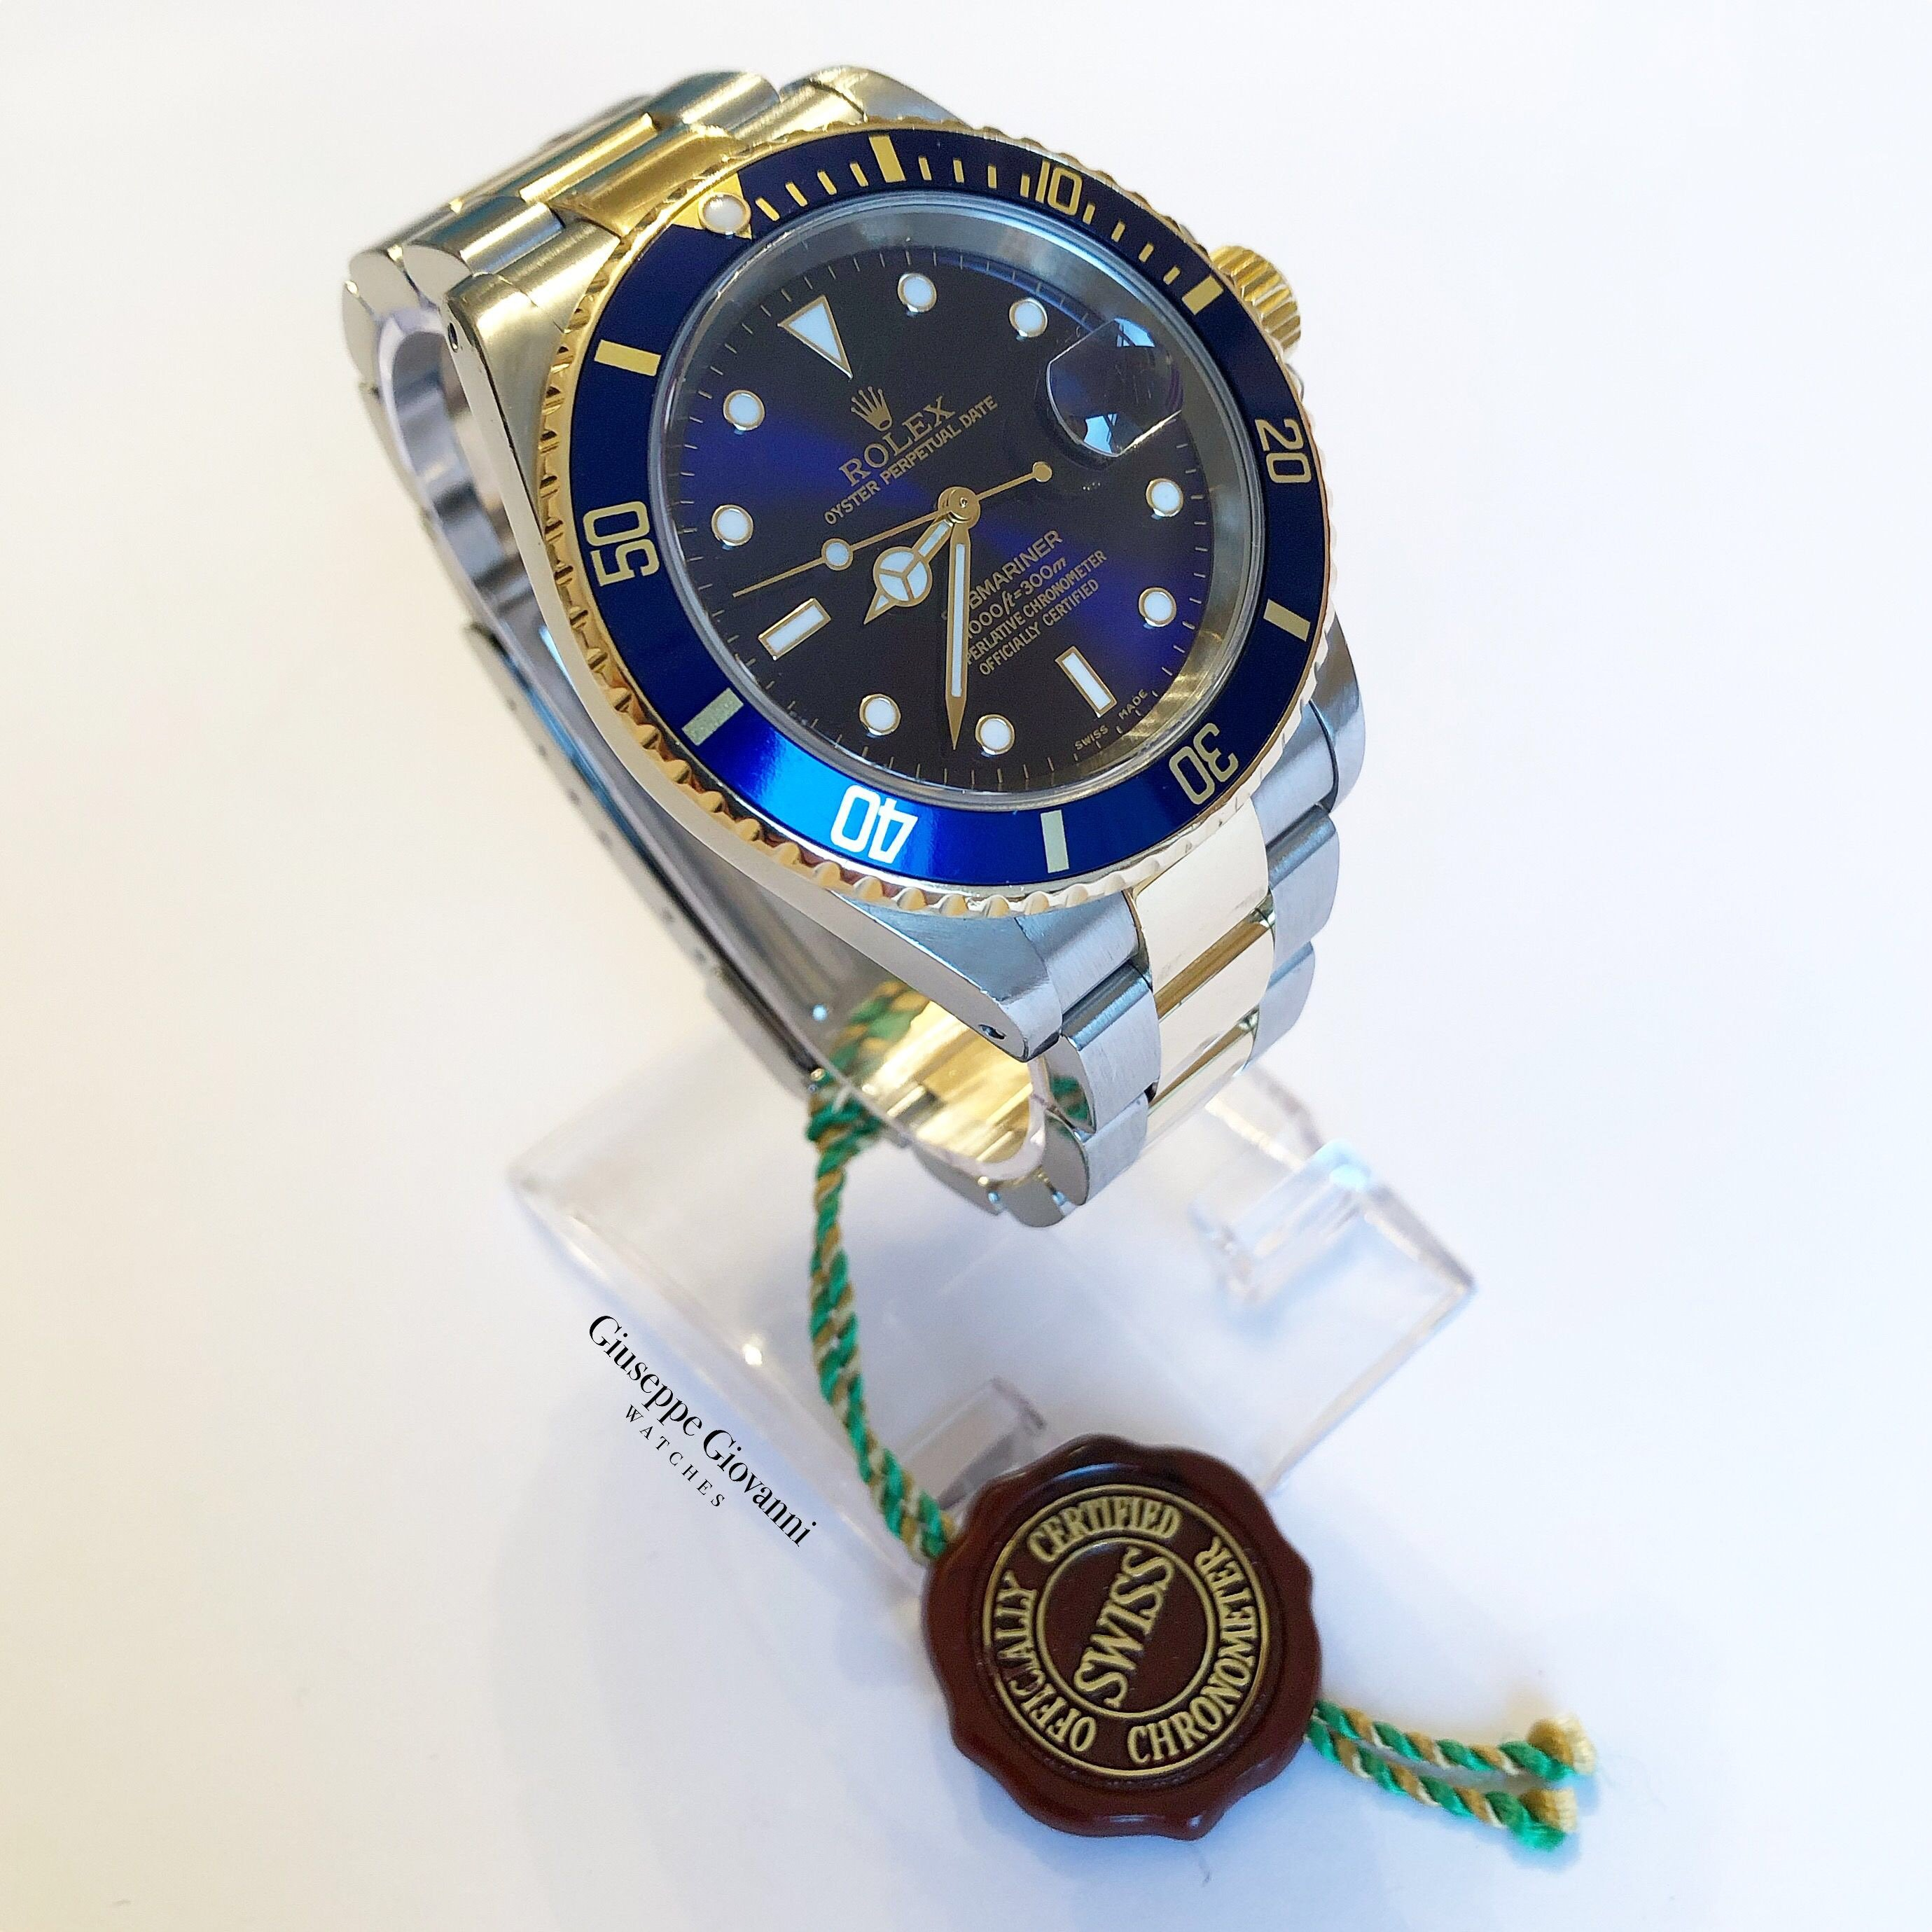 Rolex Submariner 16613 YellowGoldOystersteel OysterBracelet BlueDial 1